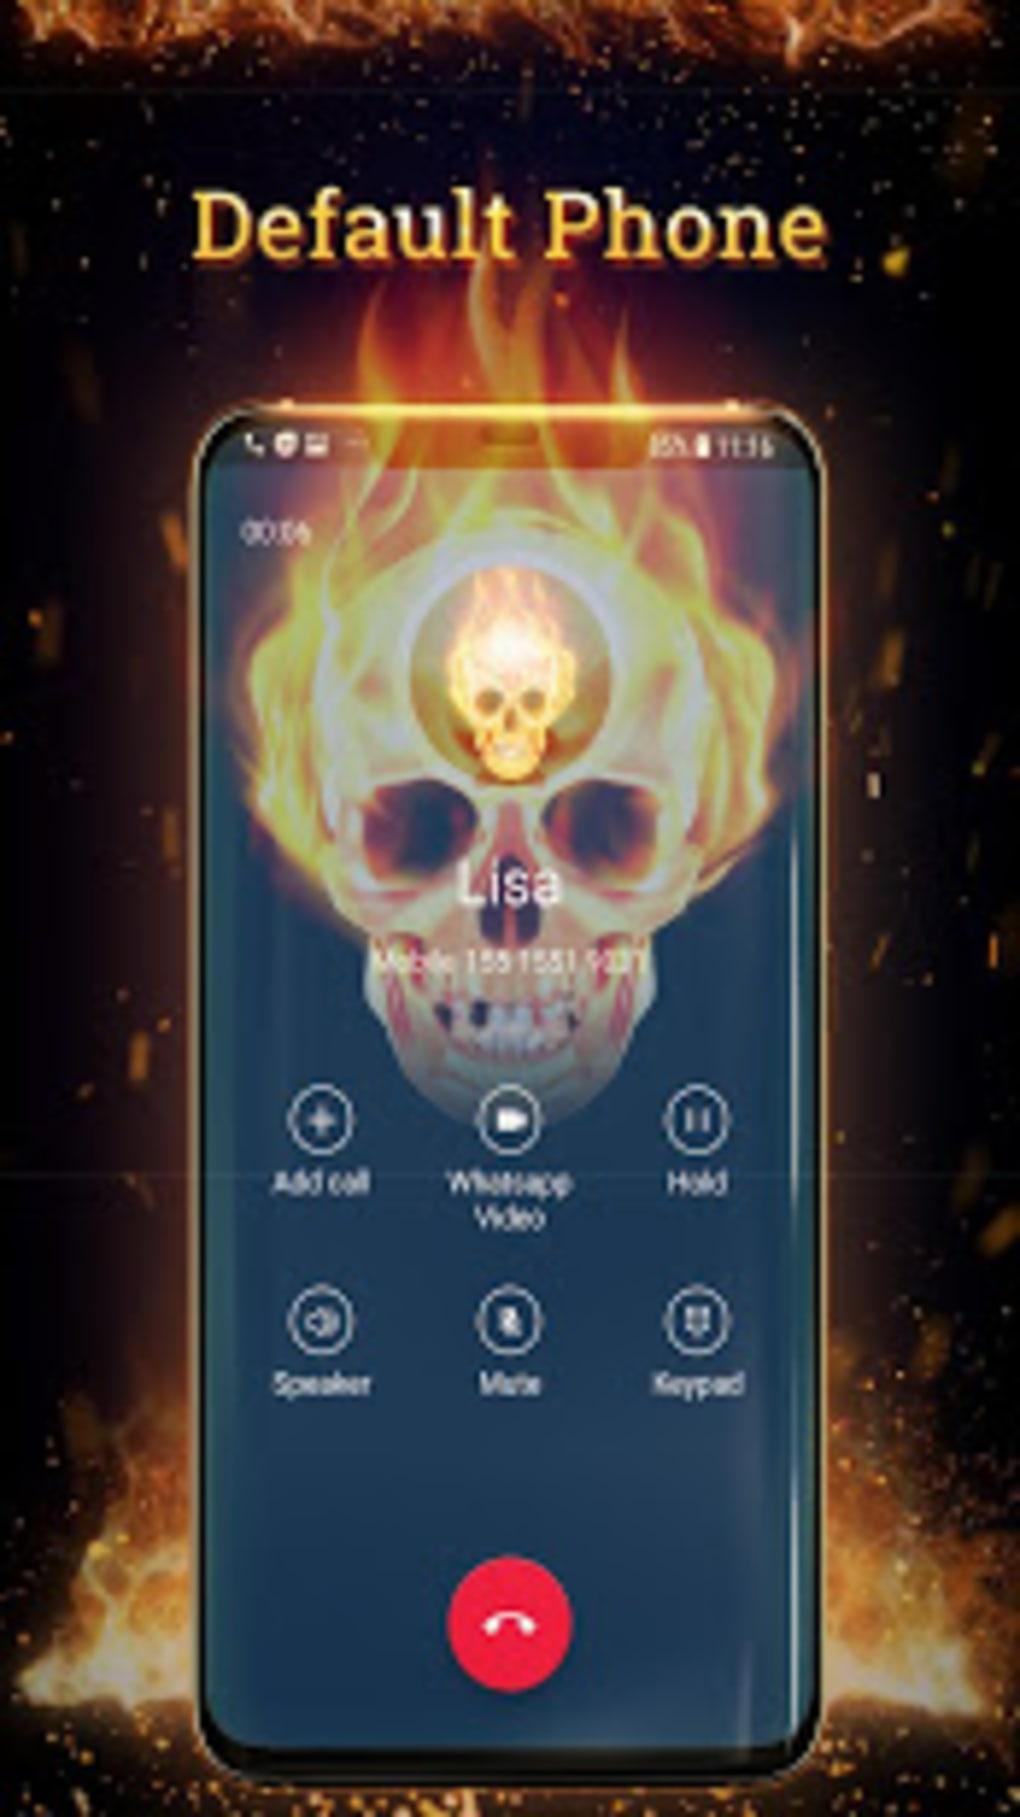 Fire Messenger for SMS - Default SMSPhone handler for Android - Download